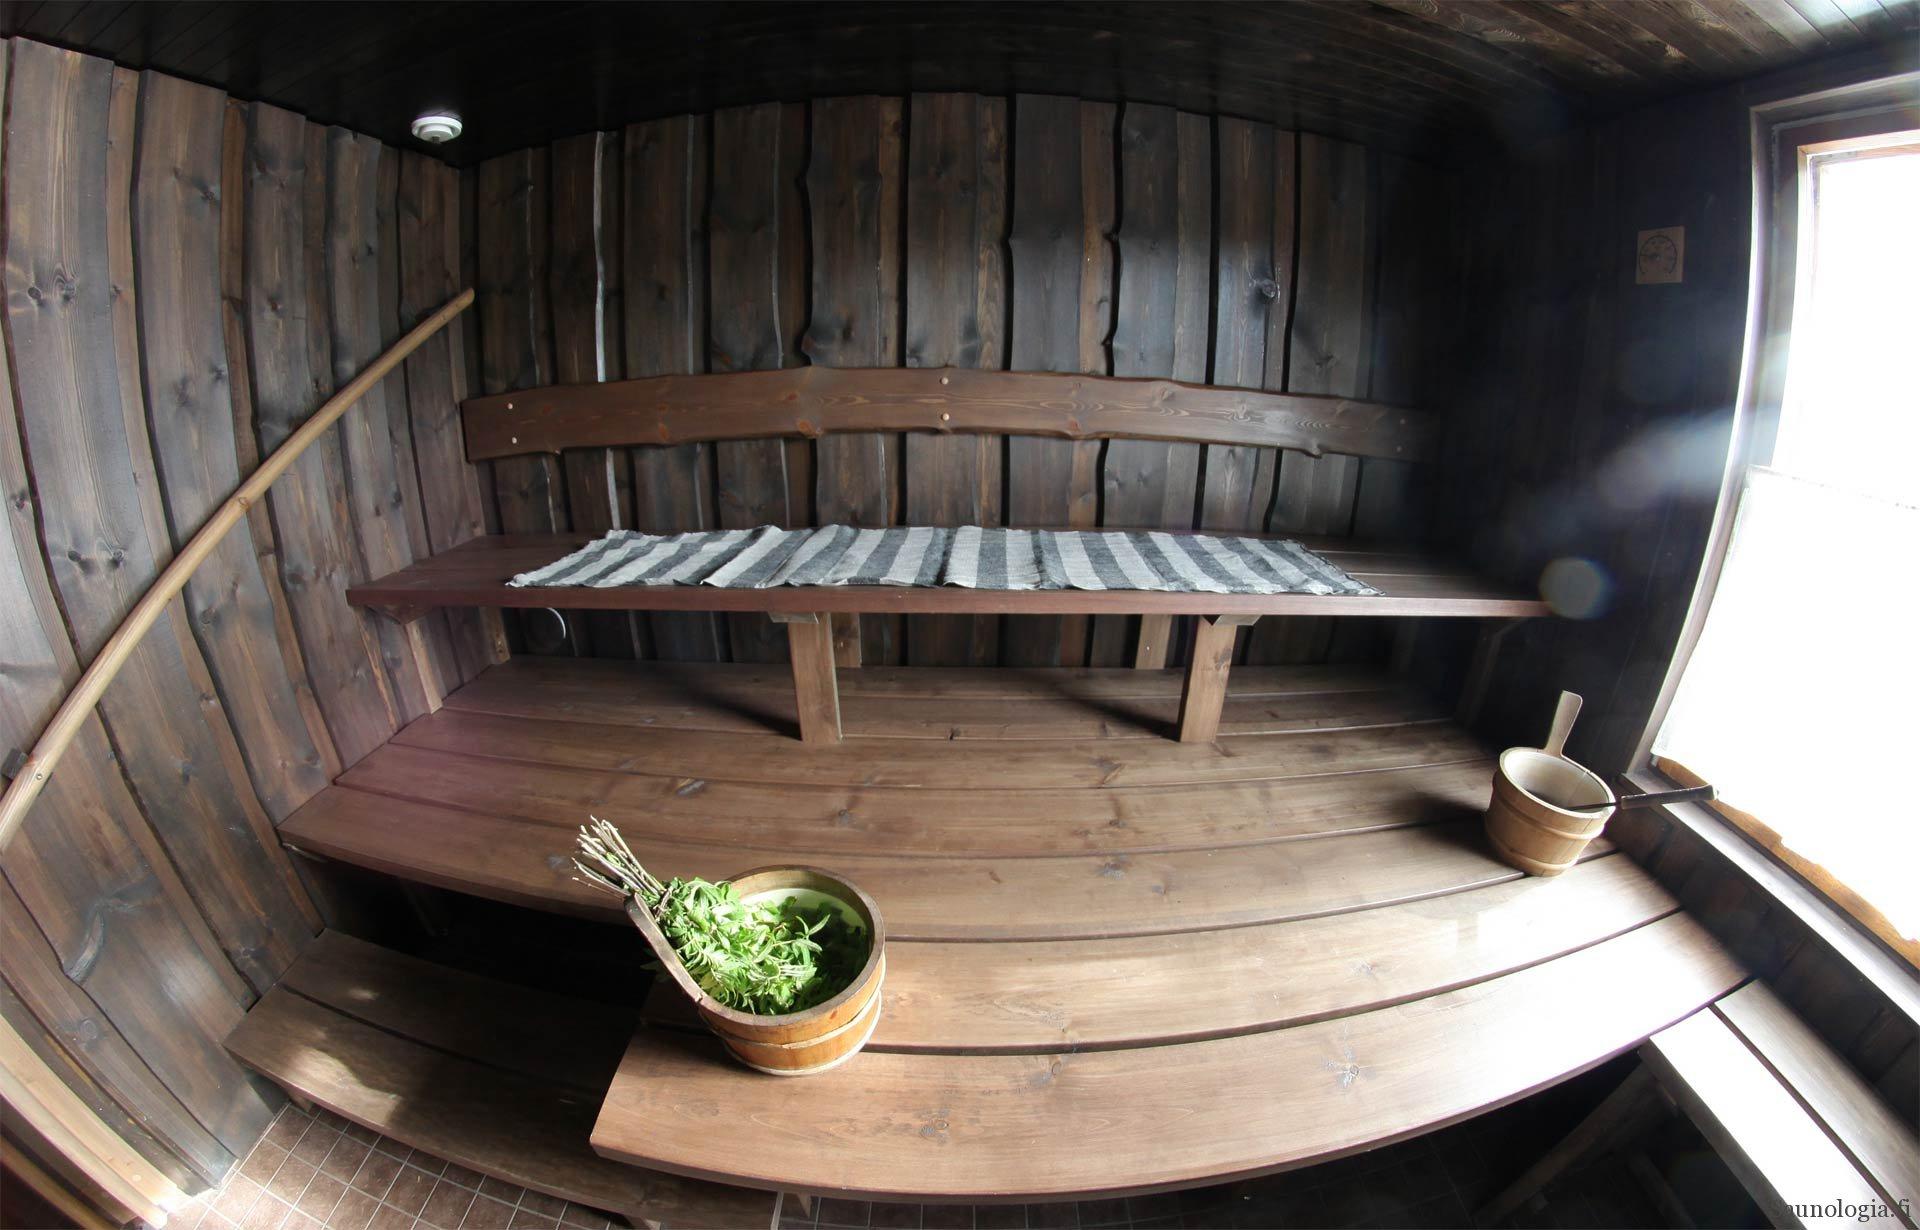 Saunologia palvelee kansainvälisiä saunan parantajia